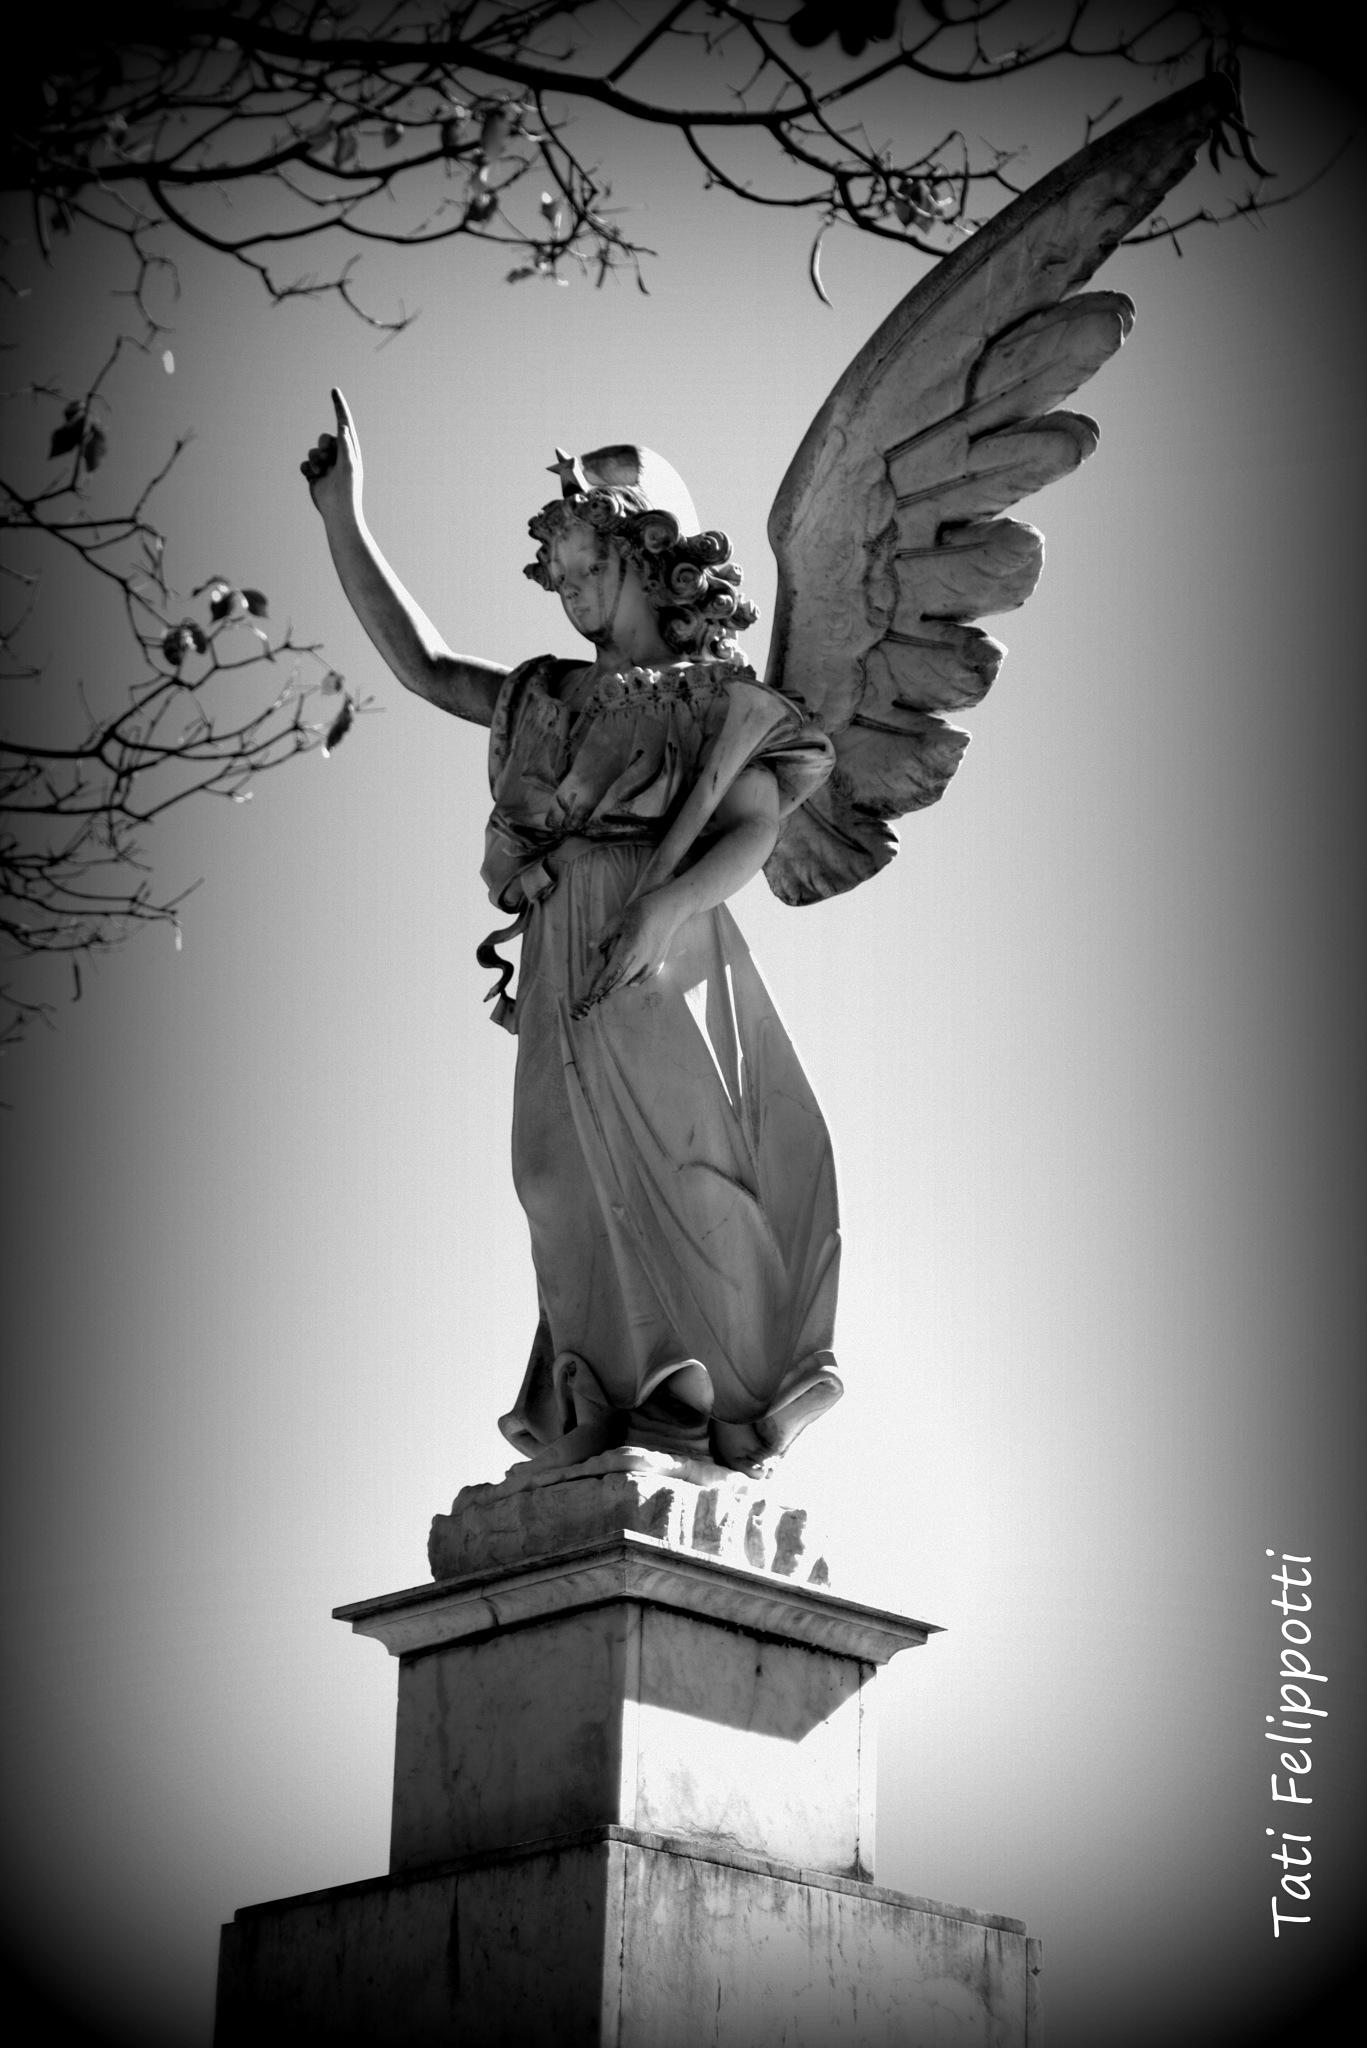 Cemetery's Angel by Tati Felippotti